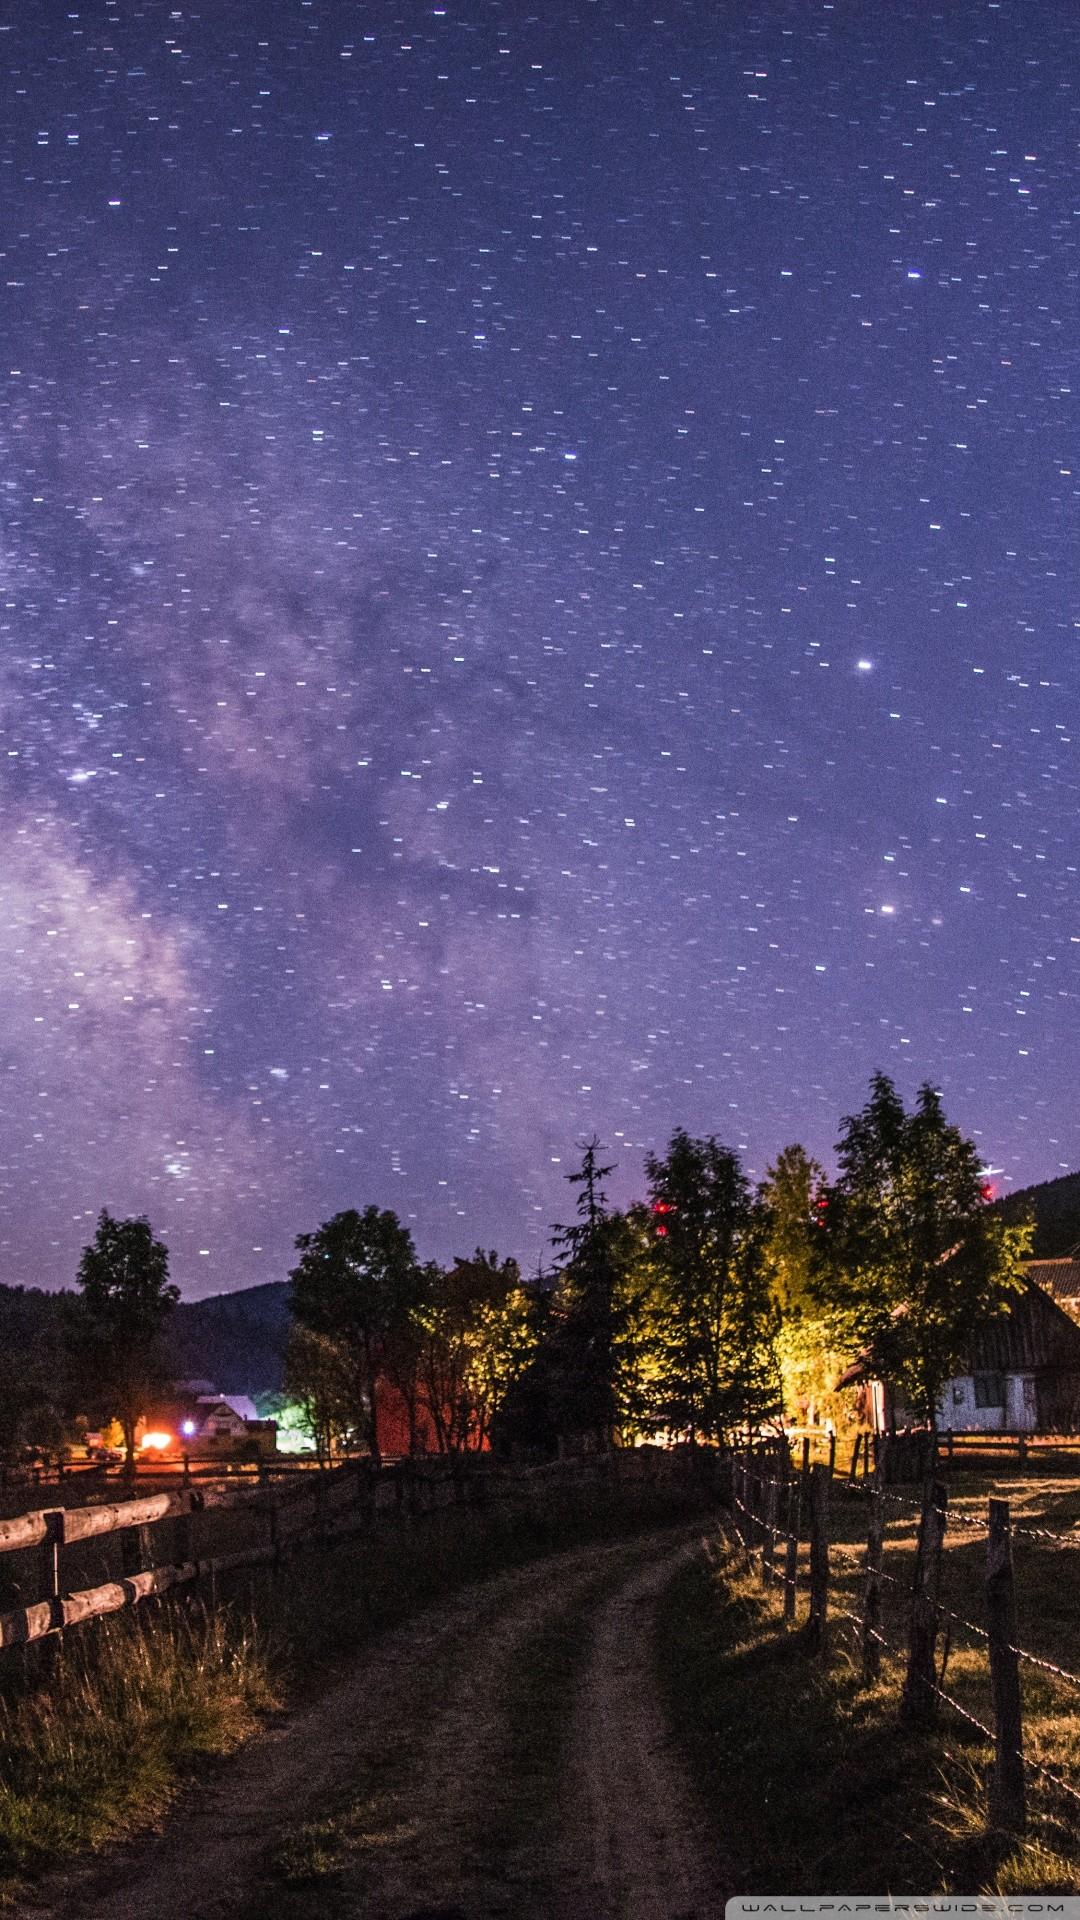 Free Milky Way phone wallpaper by rockerboy63